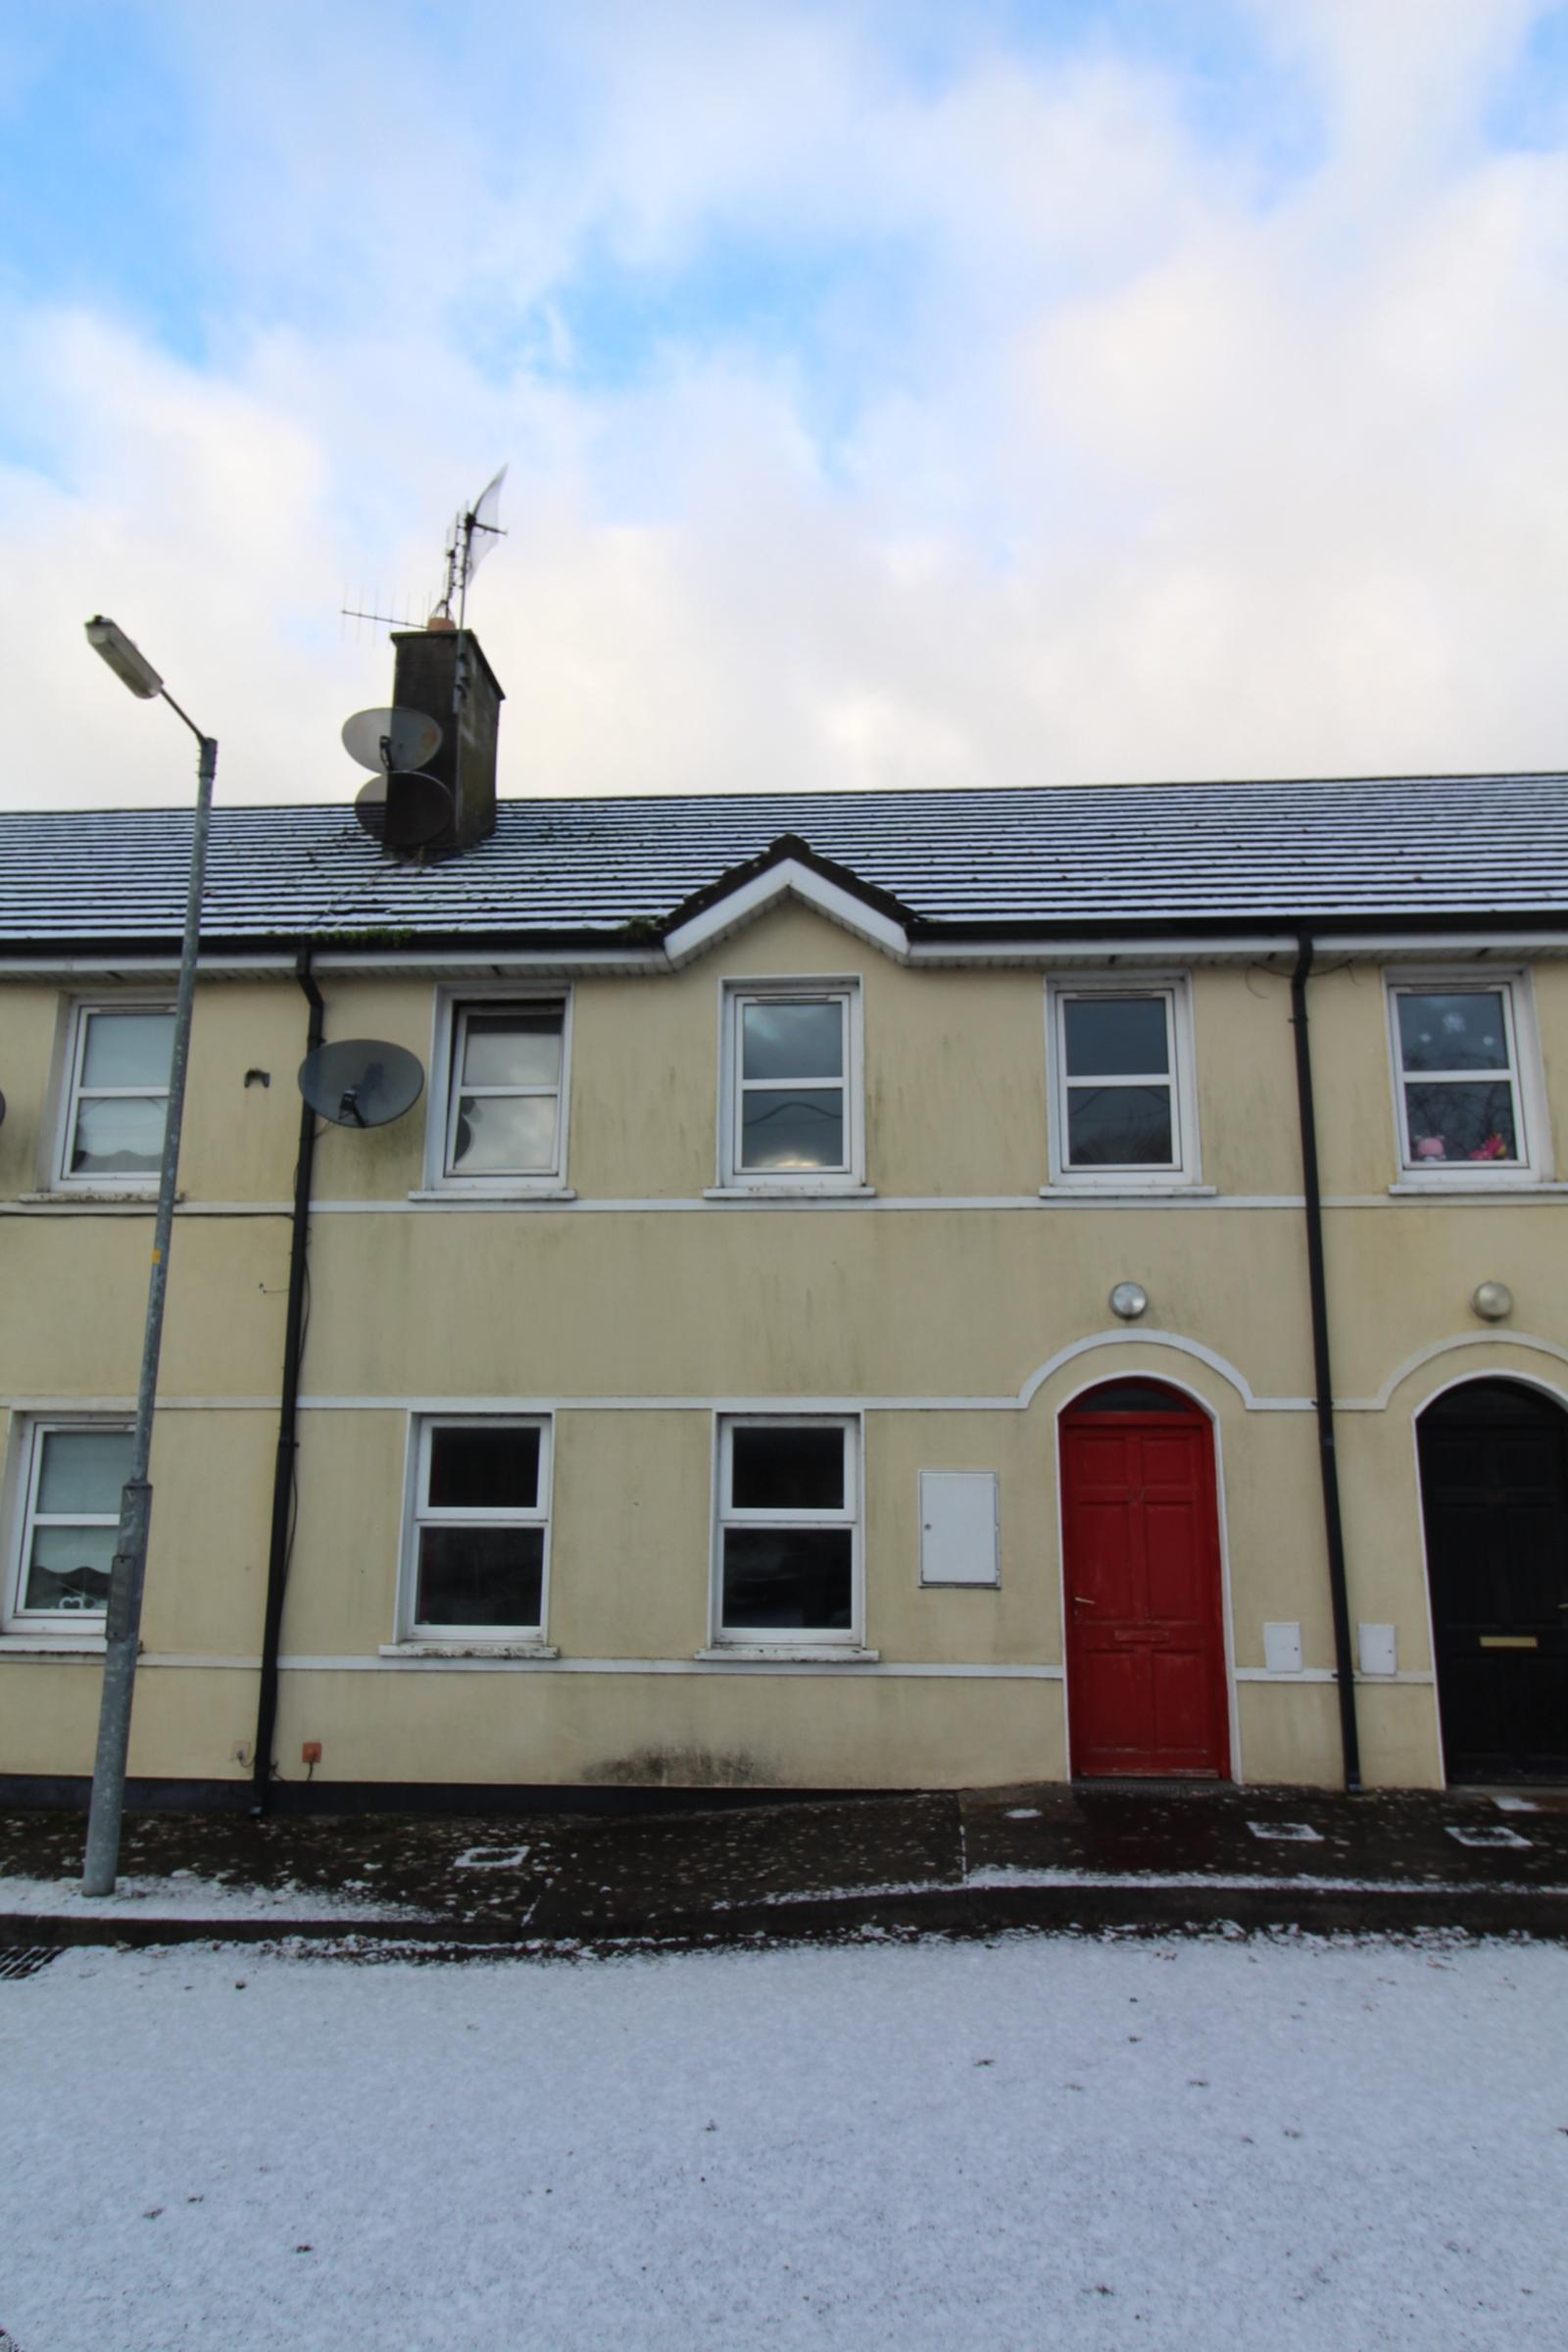 27 Pairc Na Greine, Dromahane, Co. Cork